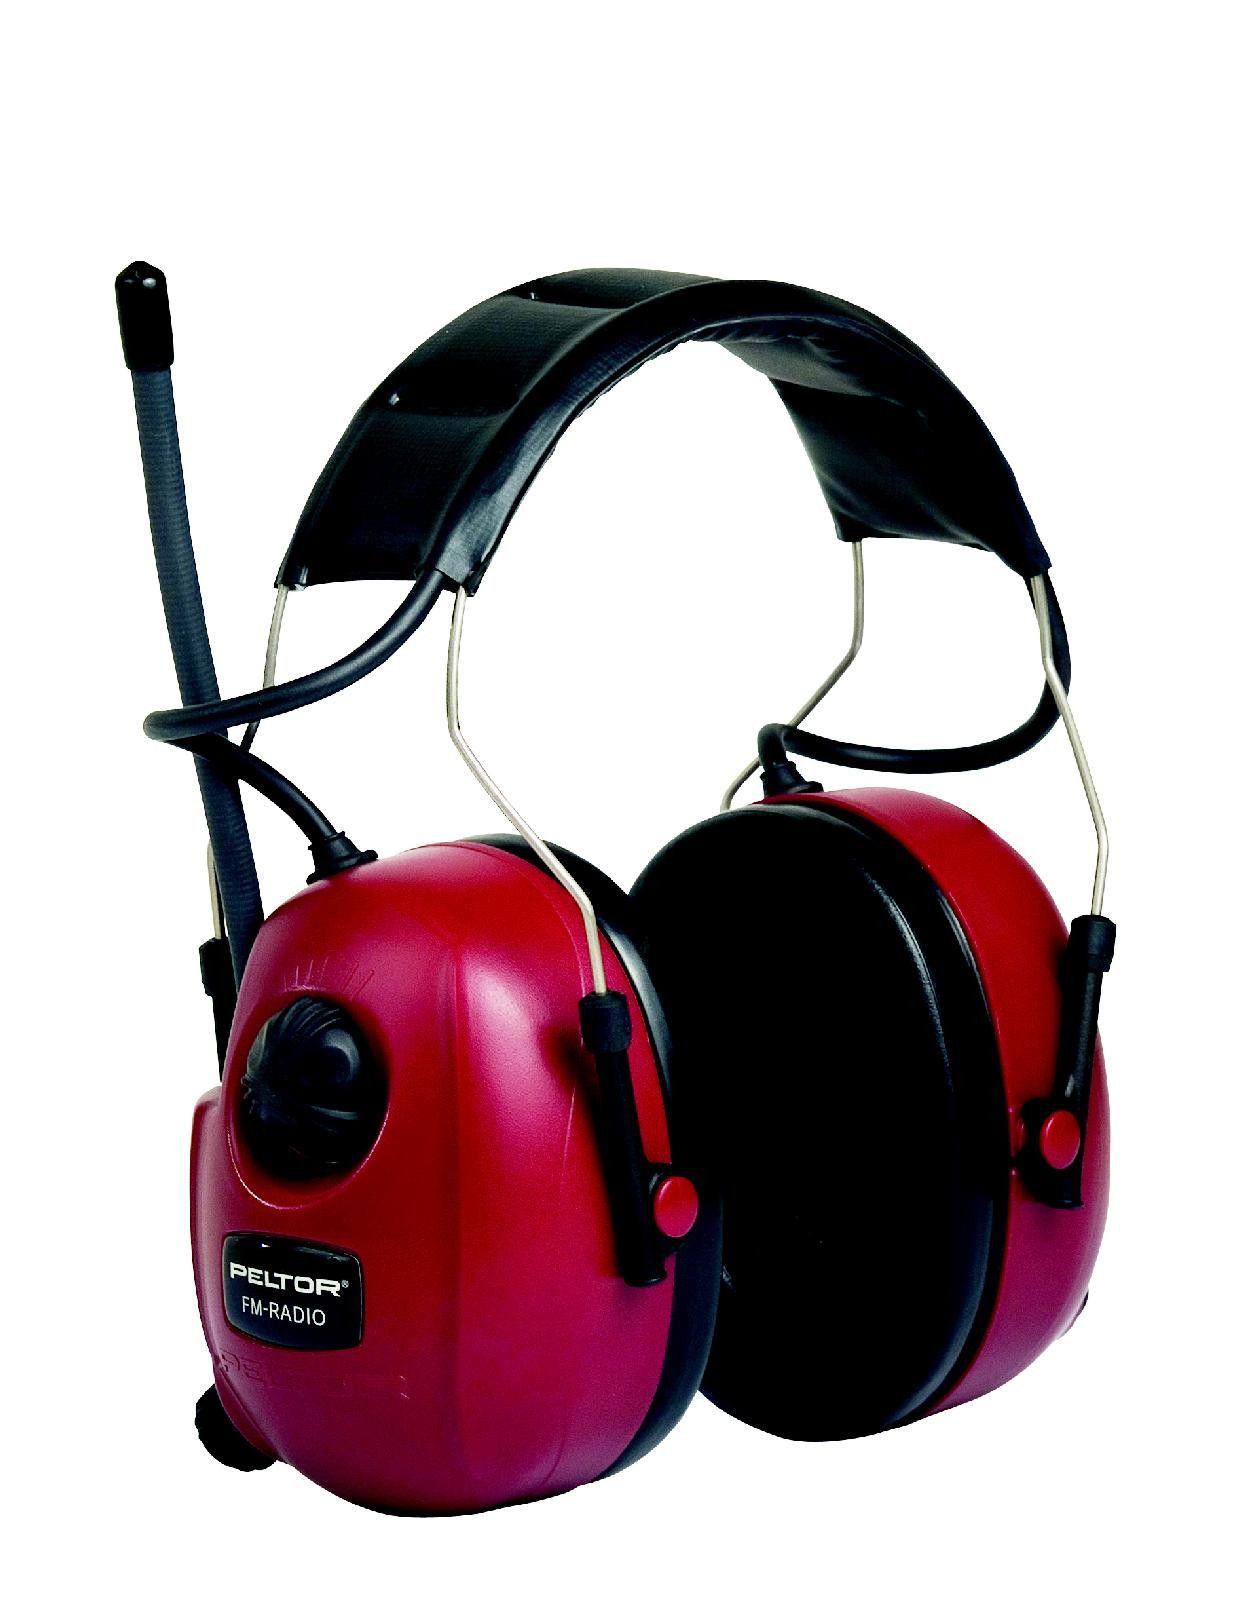 3m Peltor Fm Radio Ear Defenders With Audio Mp3 Input